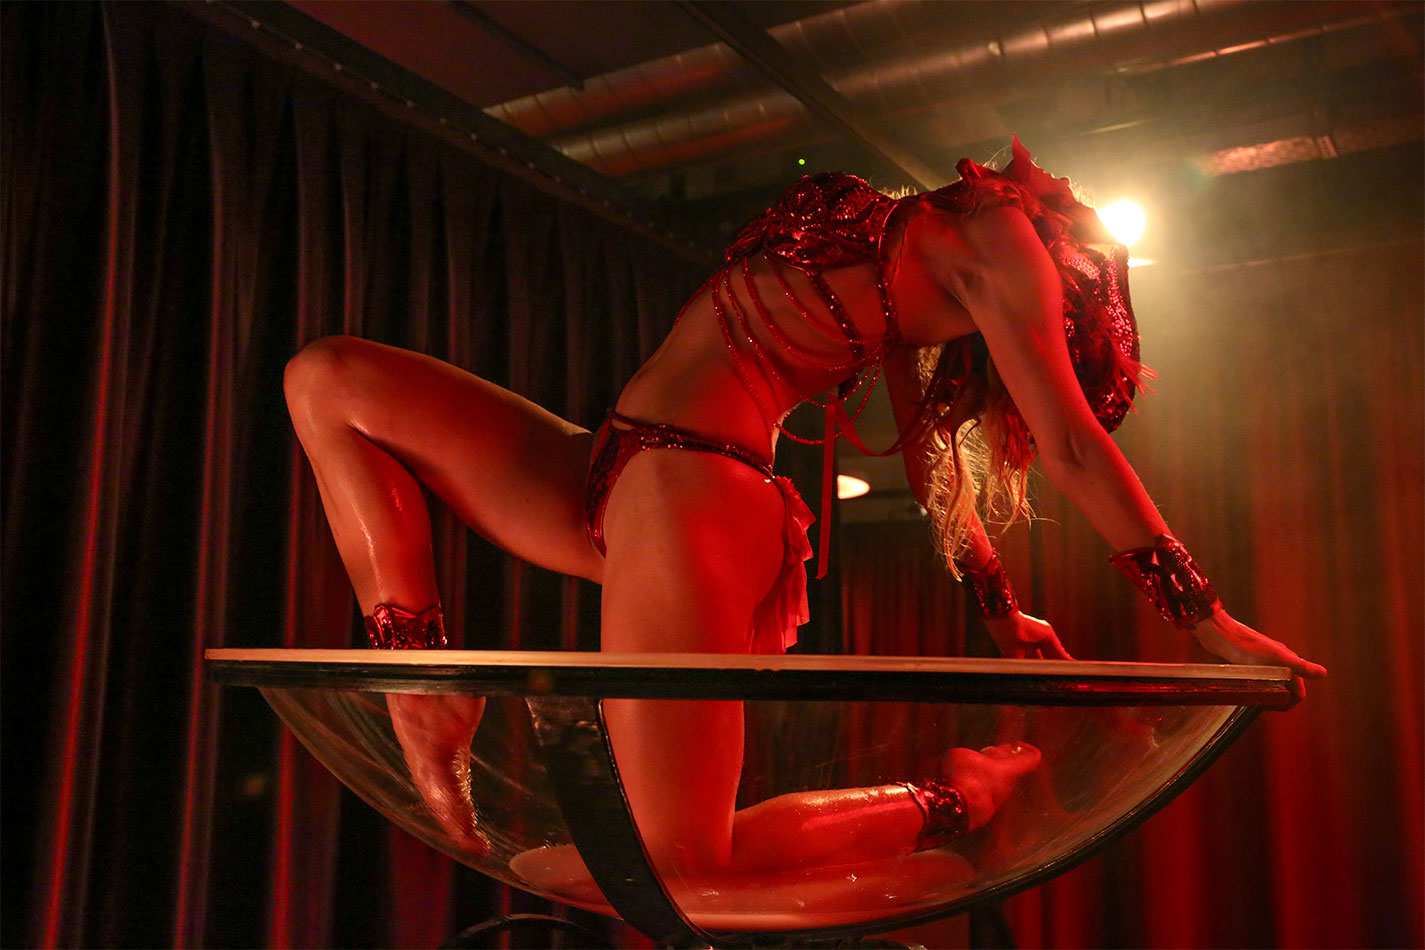 Red Carpet Show by Leony la Roc